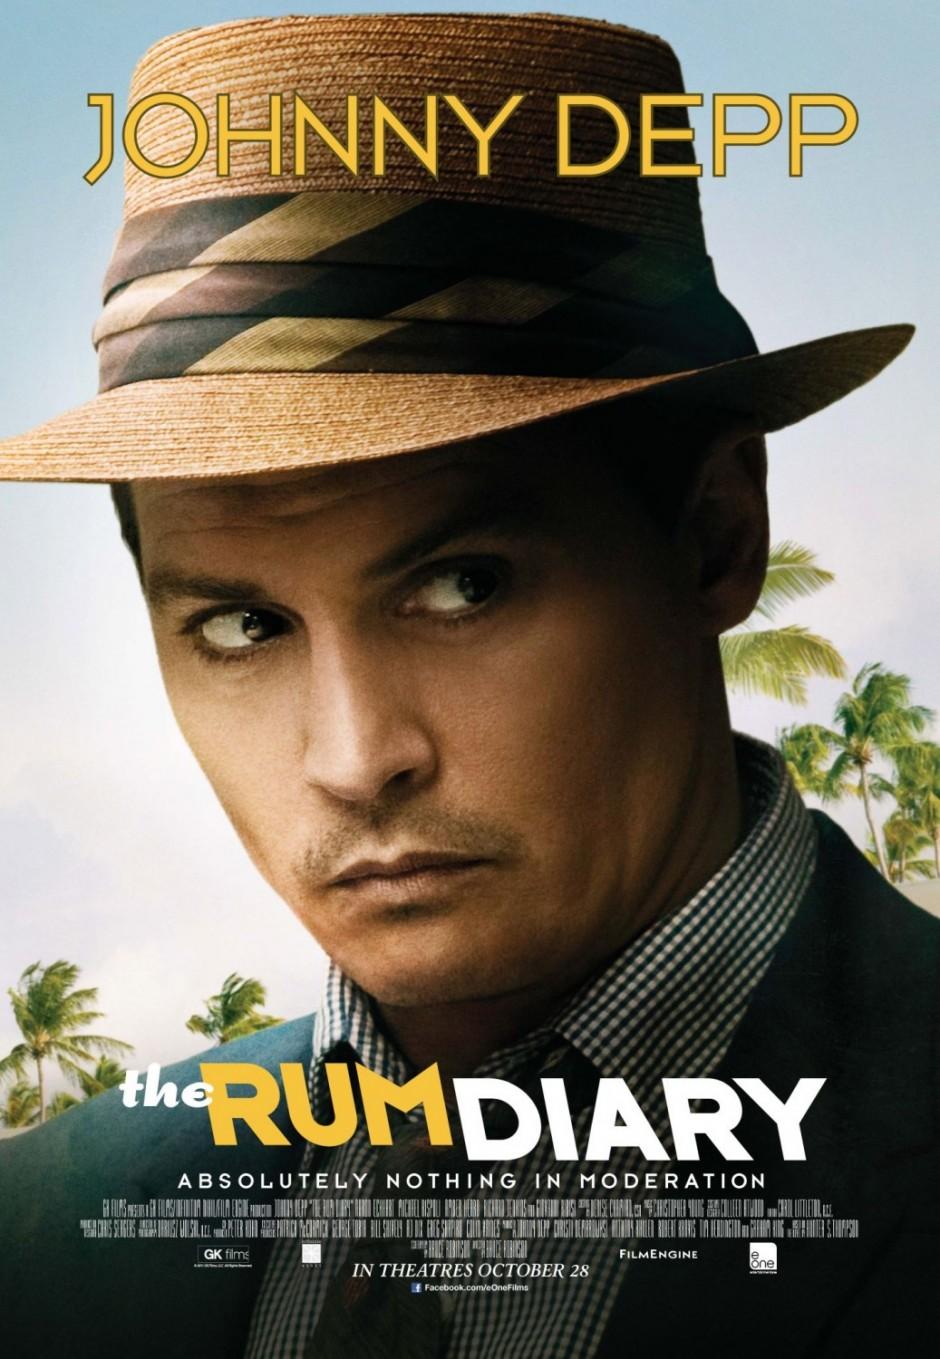 Google chrome themes johnny depp - The Rum Diary Poster